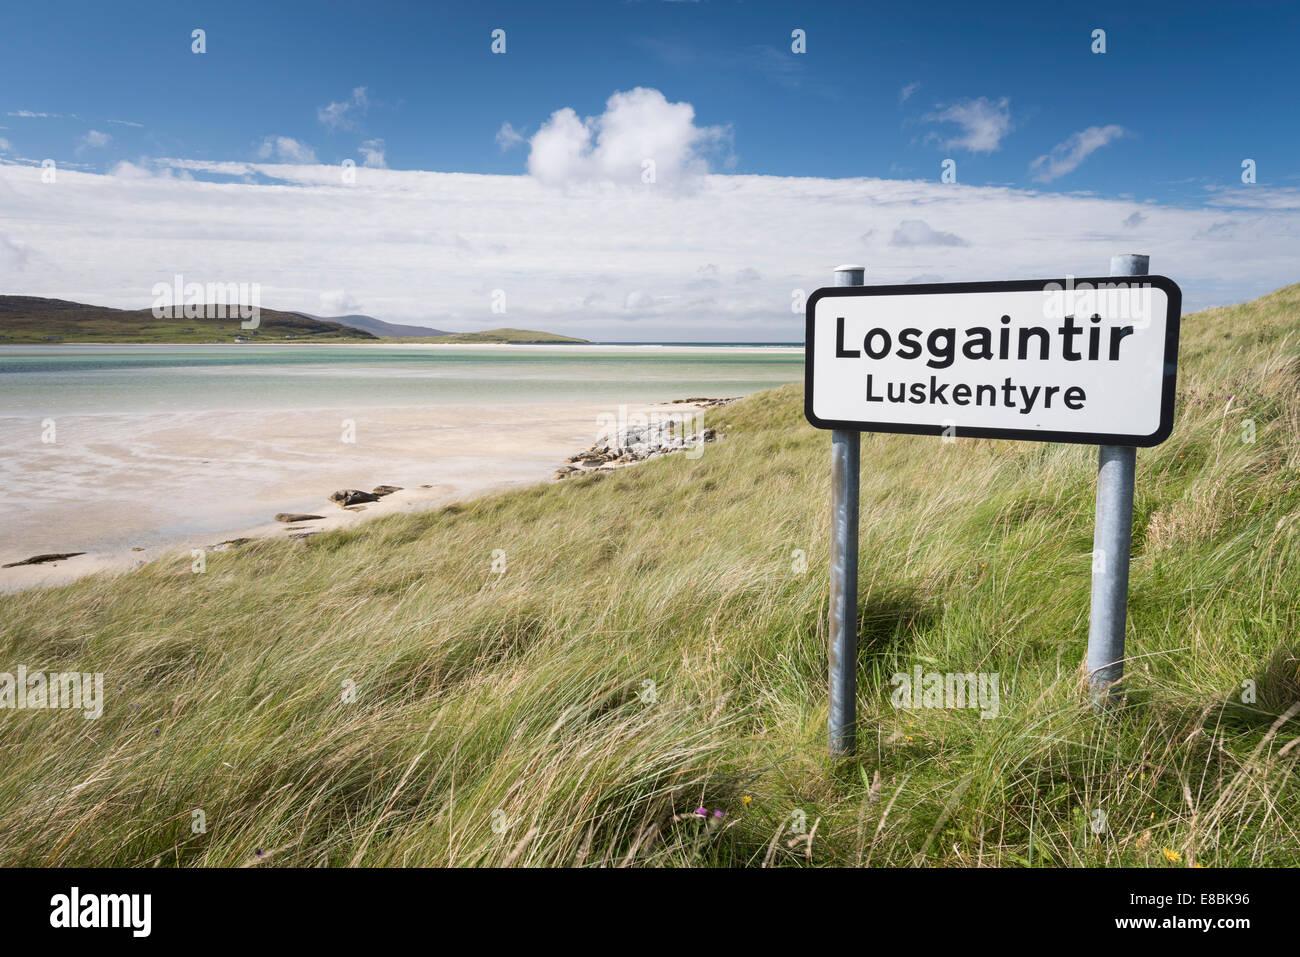 Roadsign at Luskentyre Beach, Isle of Harris, Outer Hebrides, Scotland - Stock Image